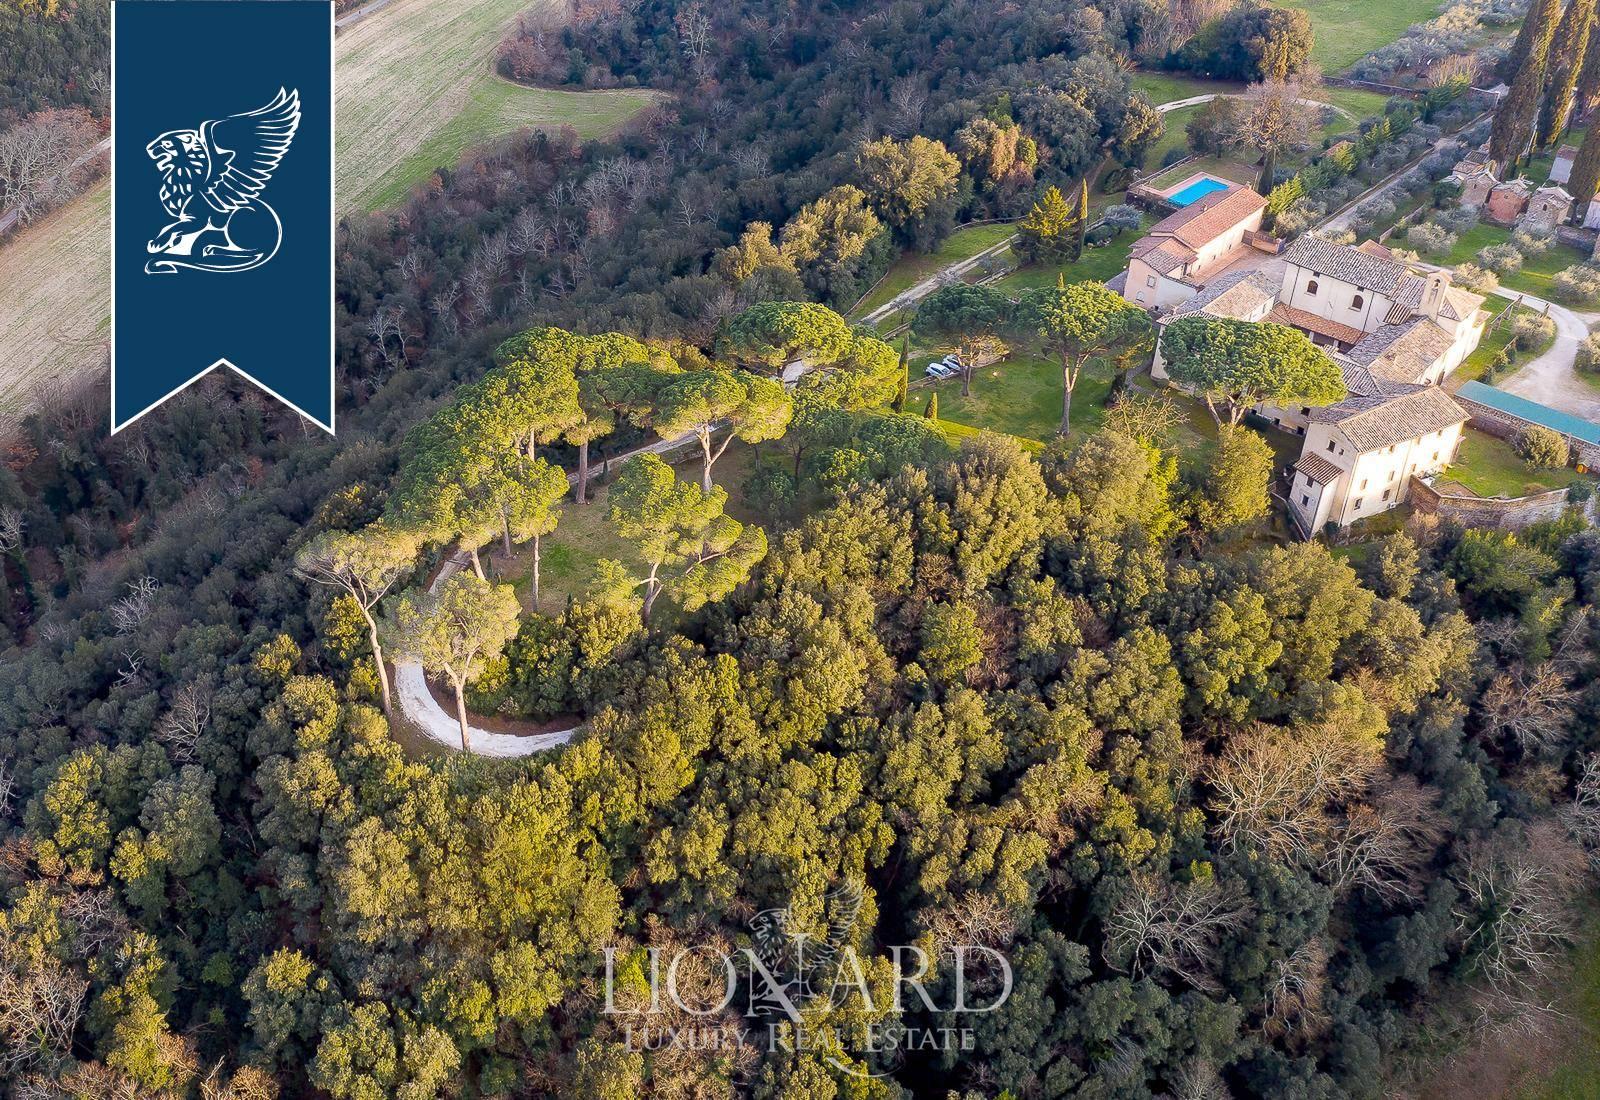 Villa in Vendita a Gallese: 0 locali, 1800 mq - Foto 5